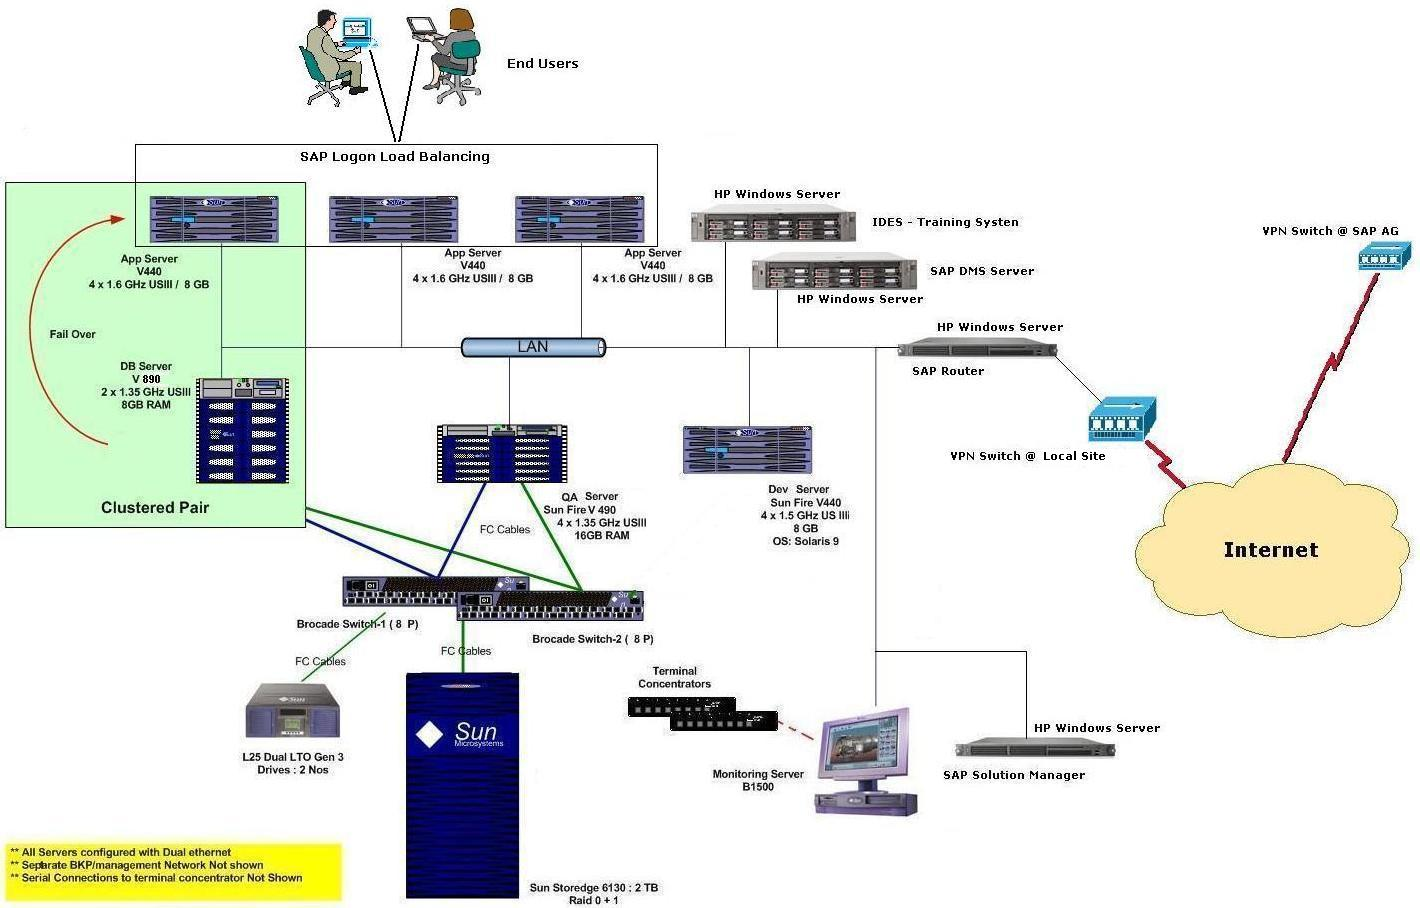 sap it infrastructure landscape example design sap hw setup for initial phase [ 1420 x 908 Pixel ]